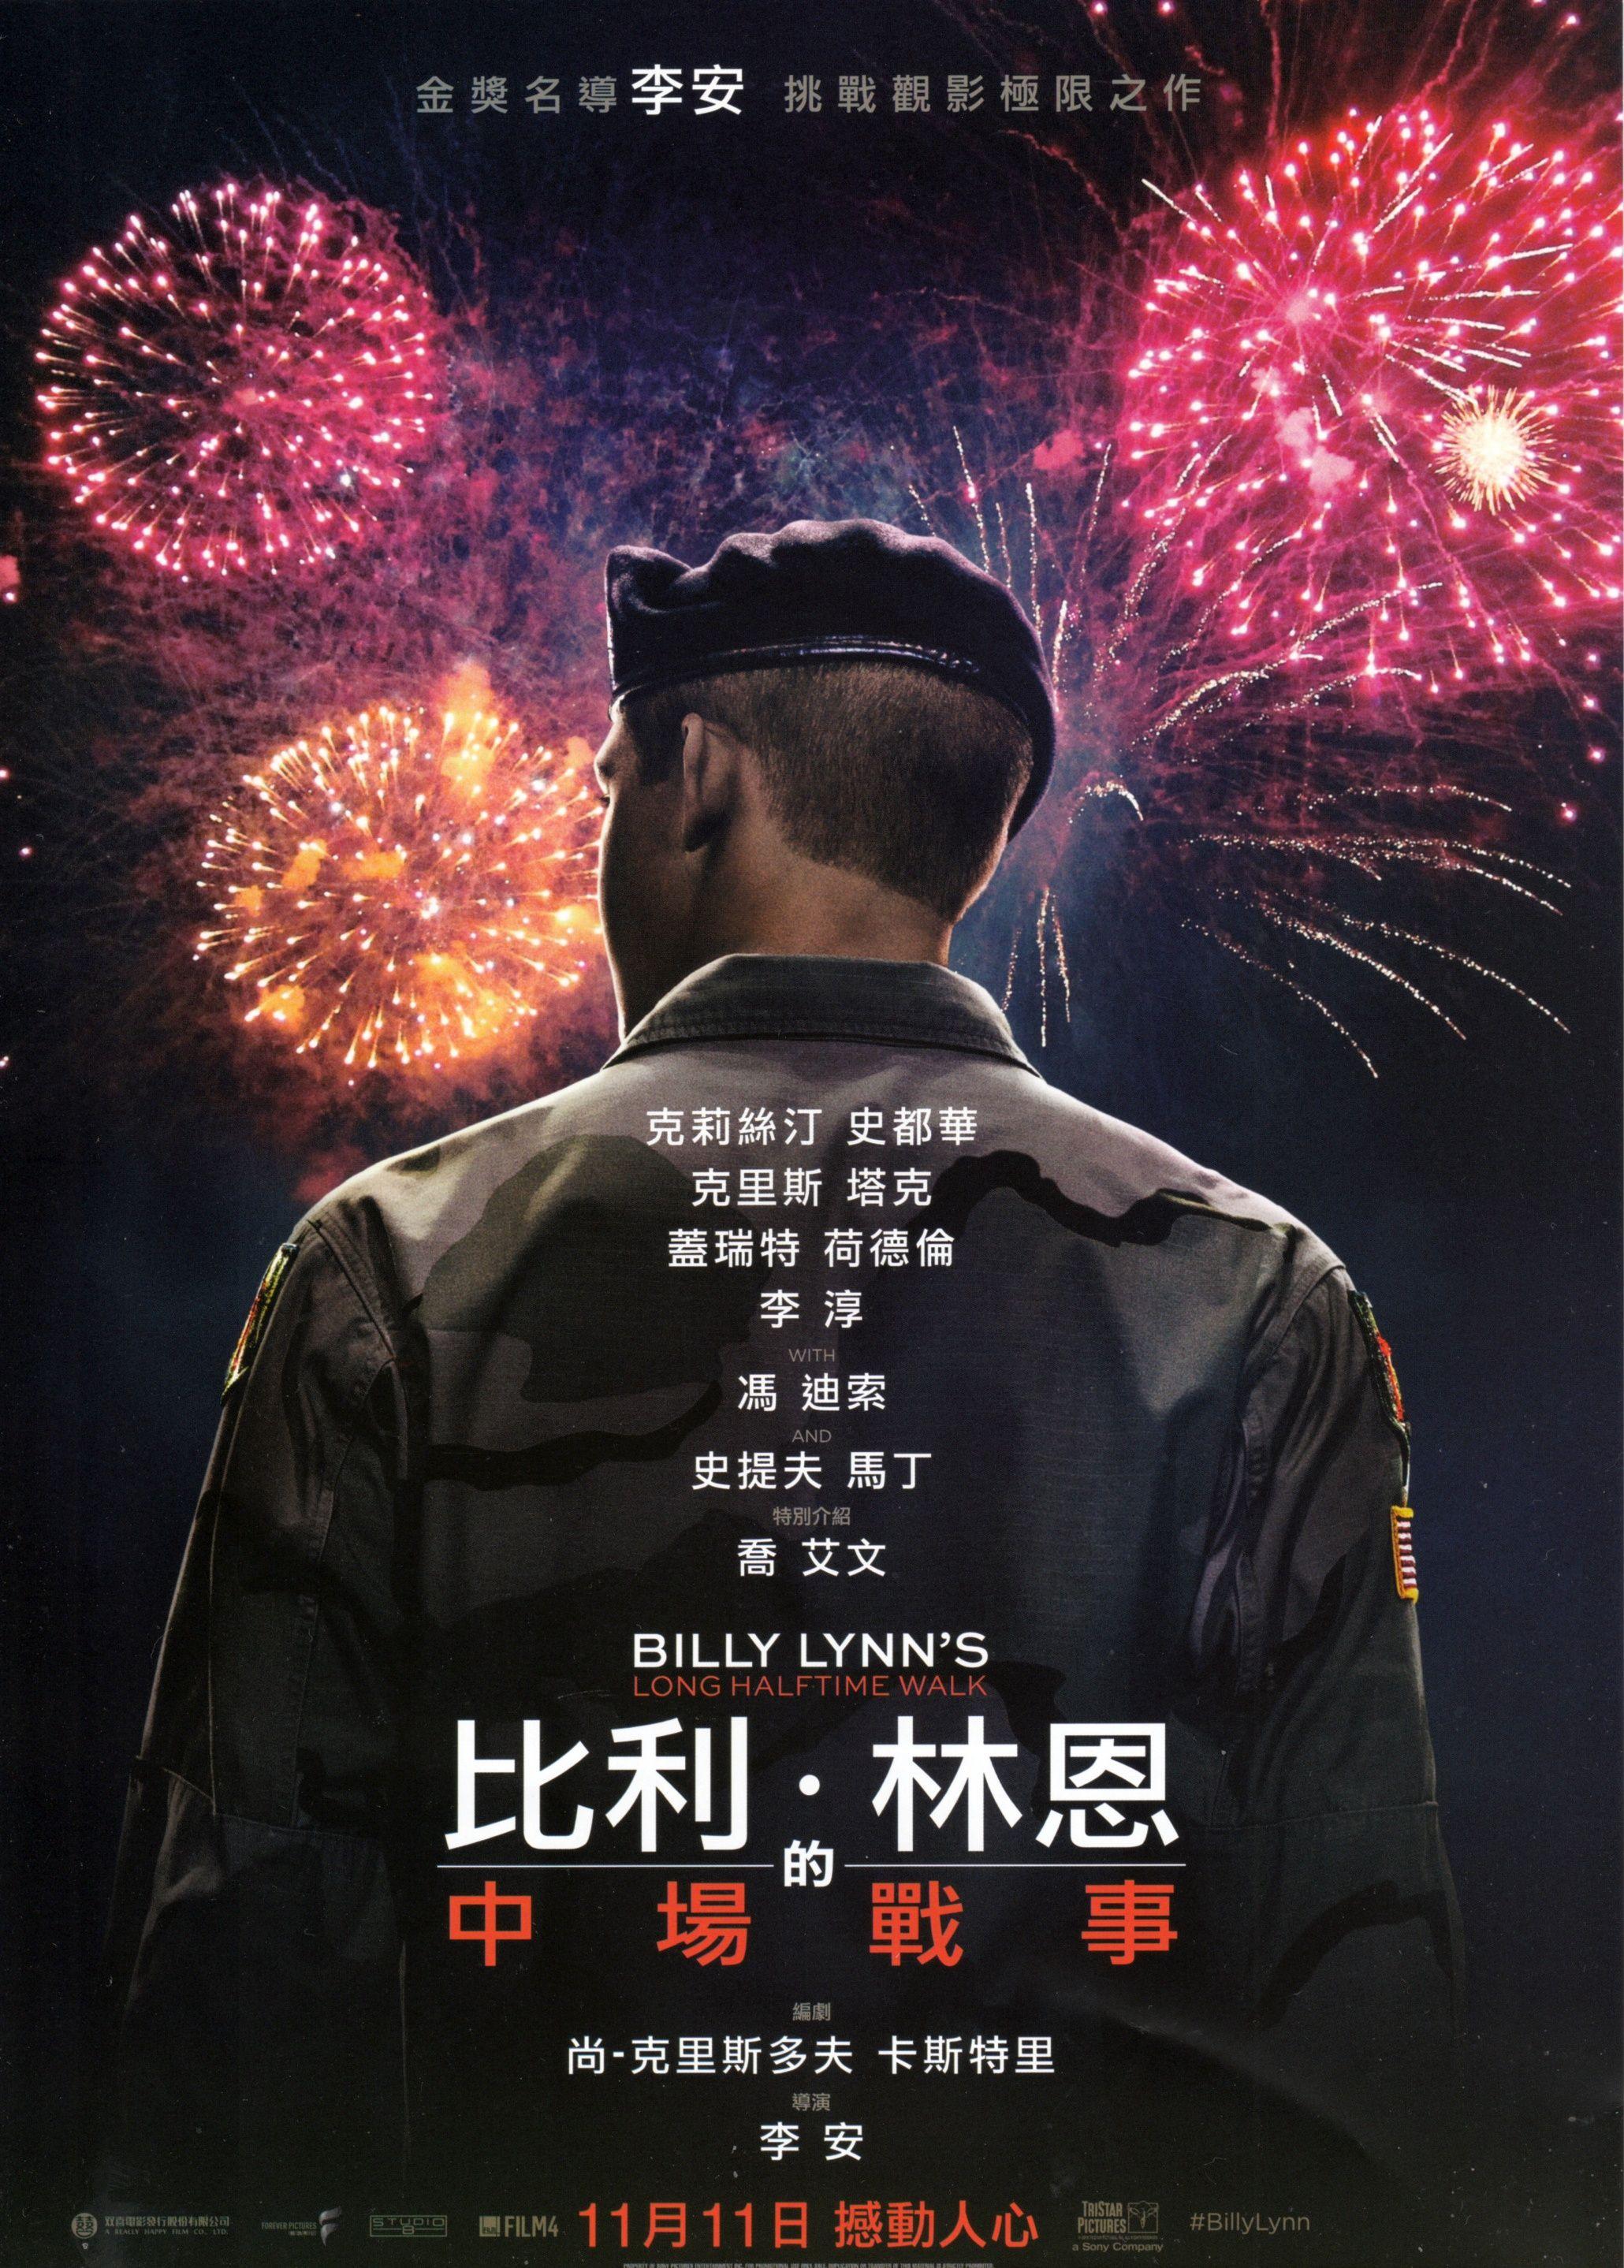 BILLY LYNN'S LONG HALFTIME WALK Issue Date 2016.11.11